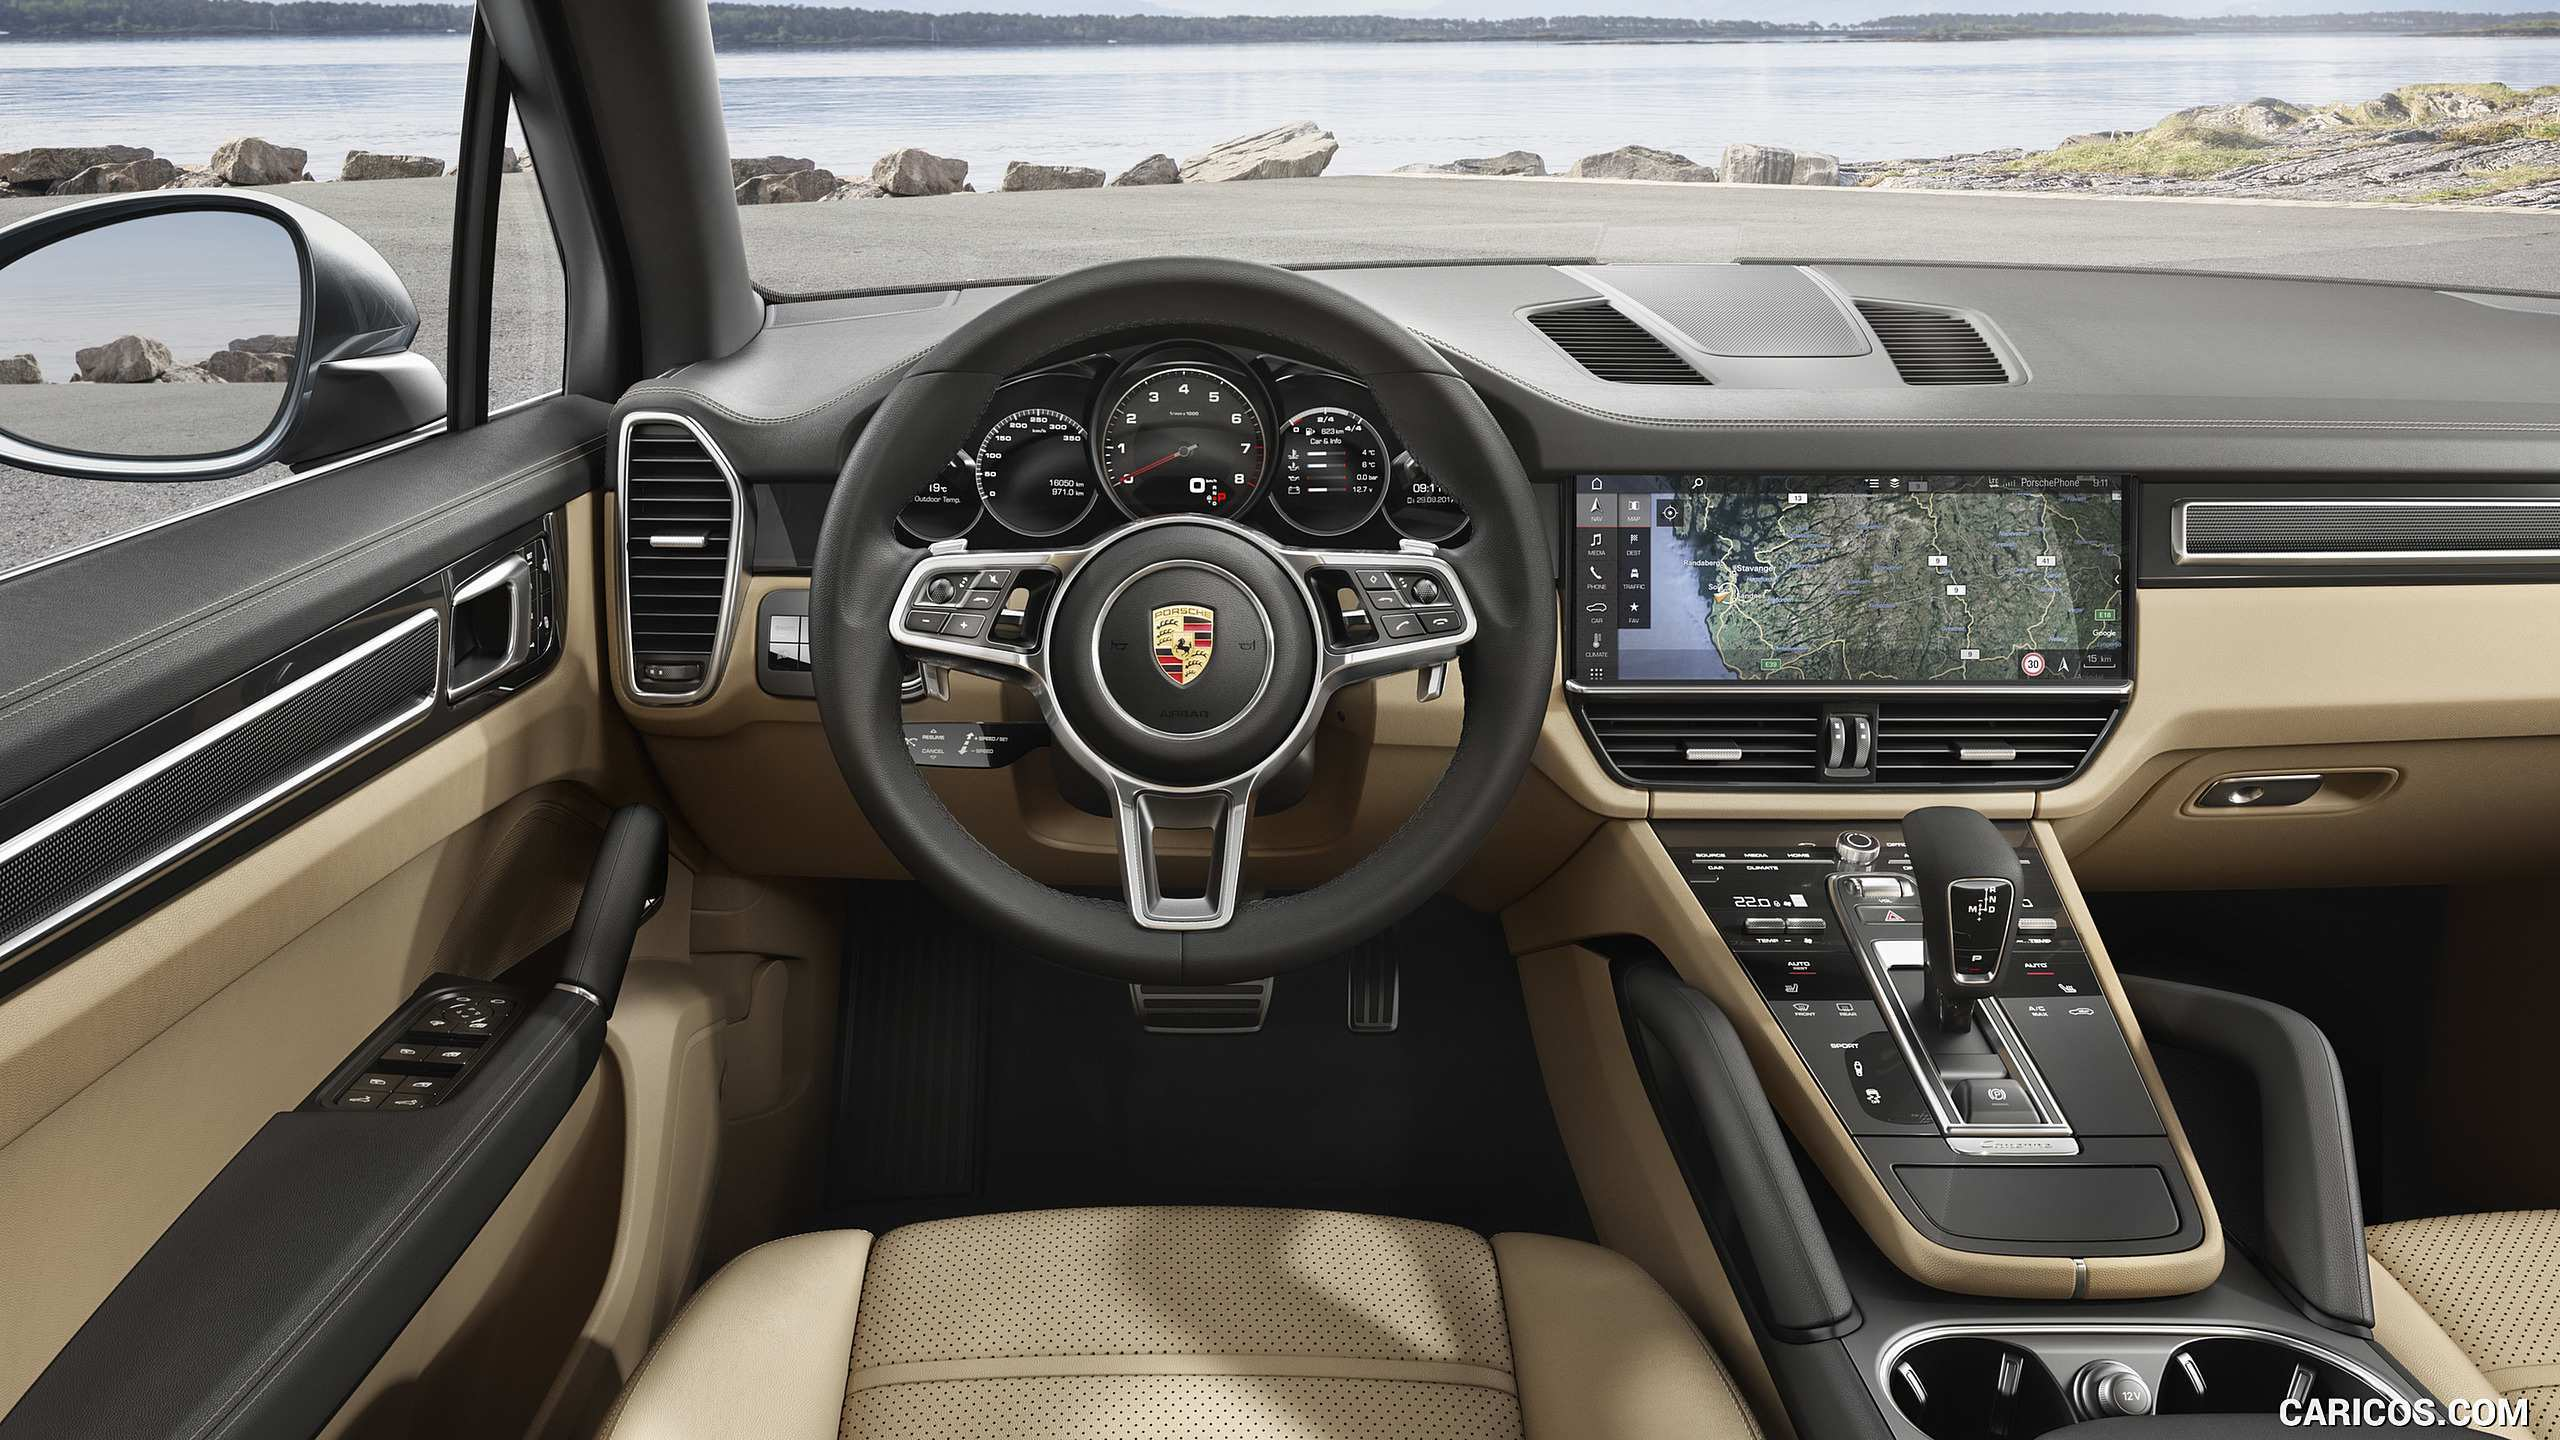 76 All New 2019 Porsche Interior Pricing by 2019 Porsche Interior